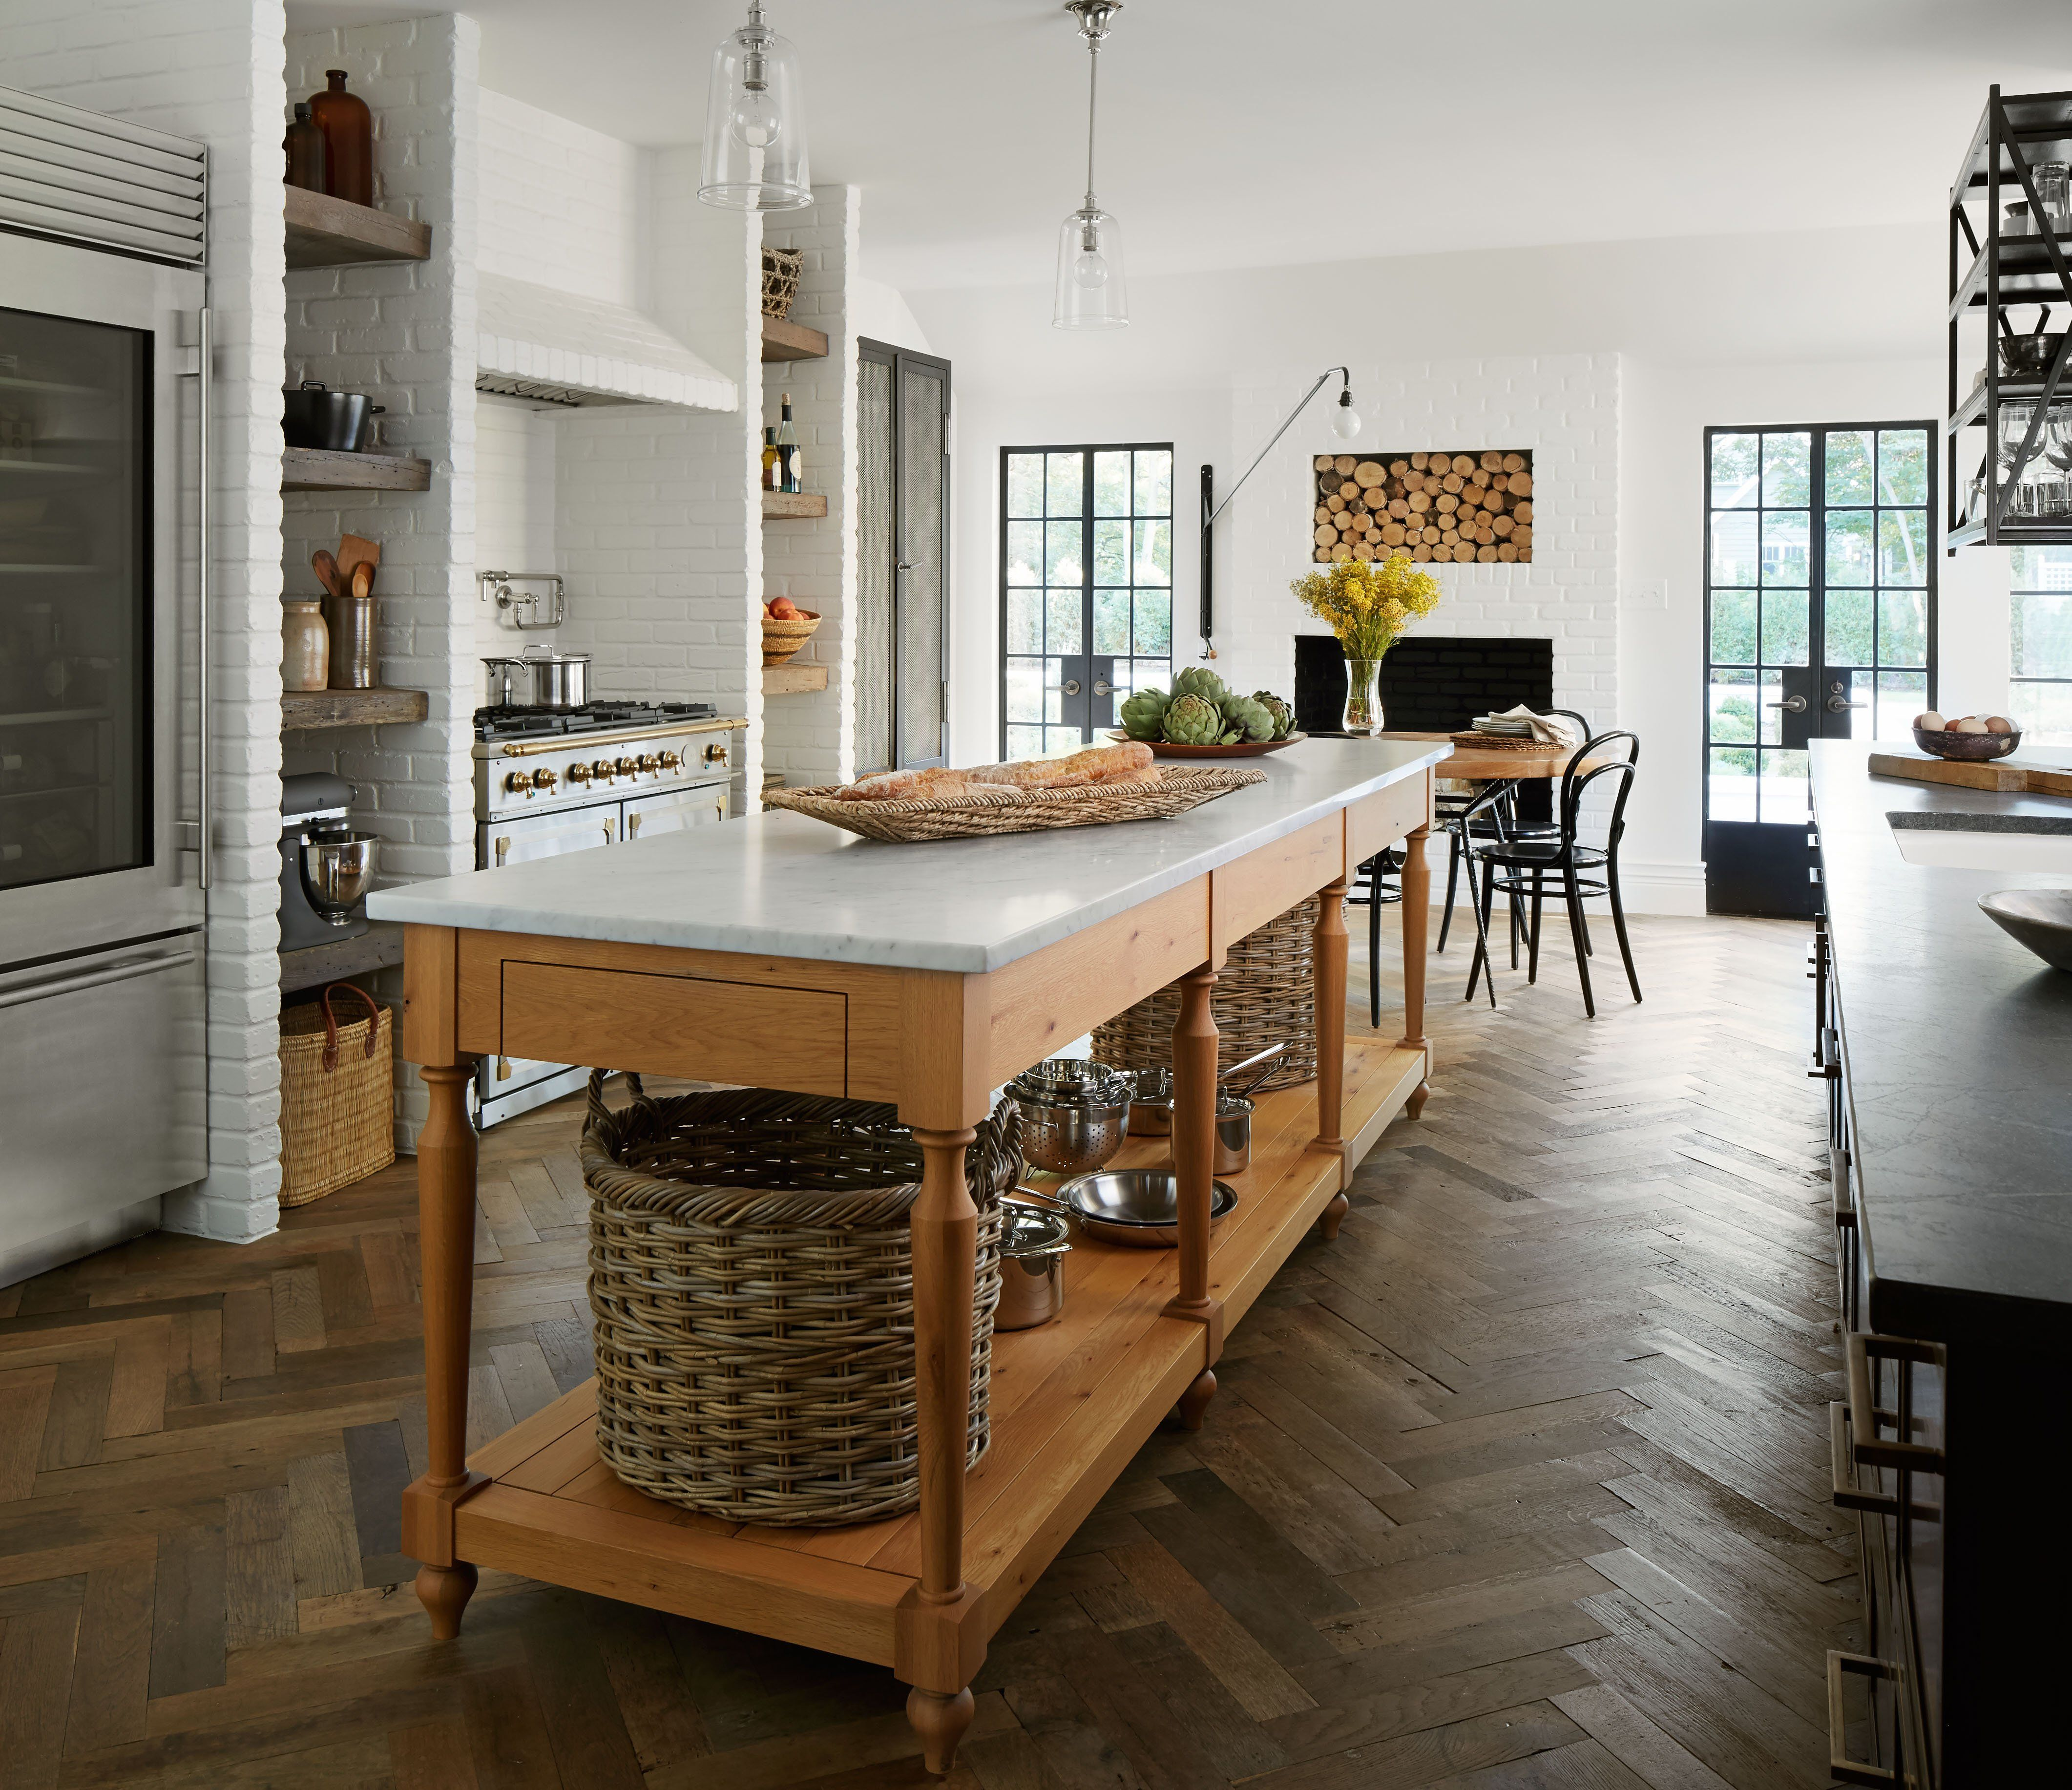 Ordinaire Kitchen In Bloomington, IL By Summer Thornton Design